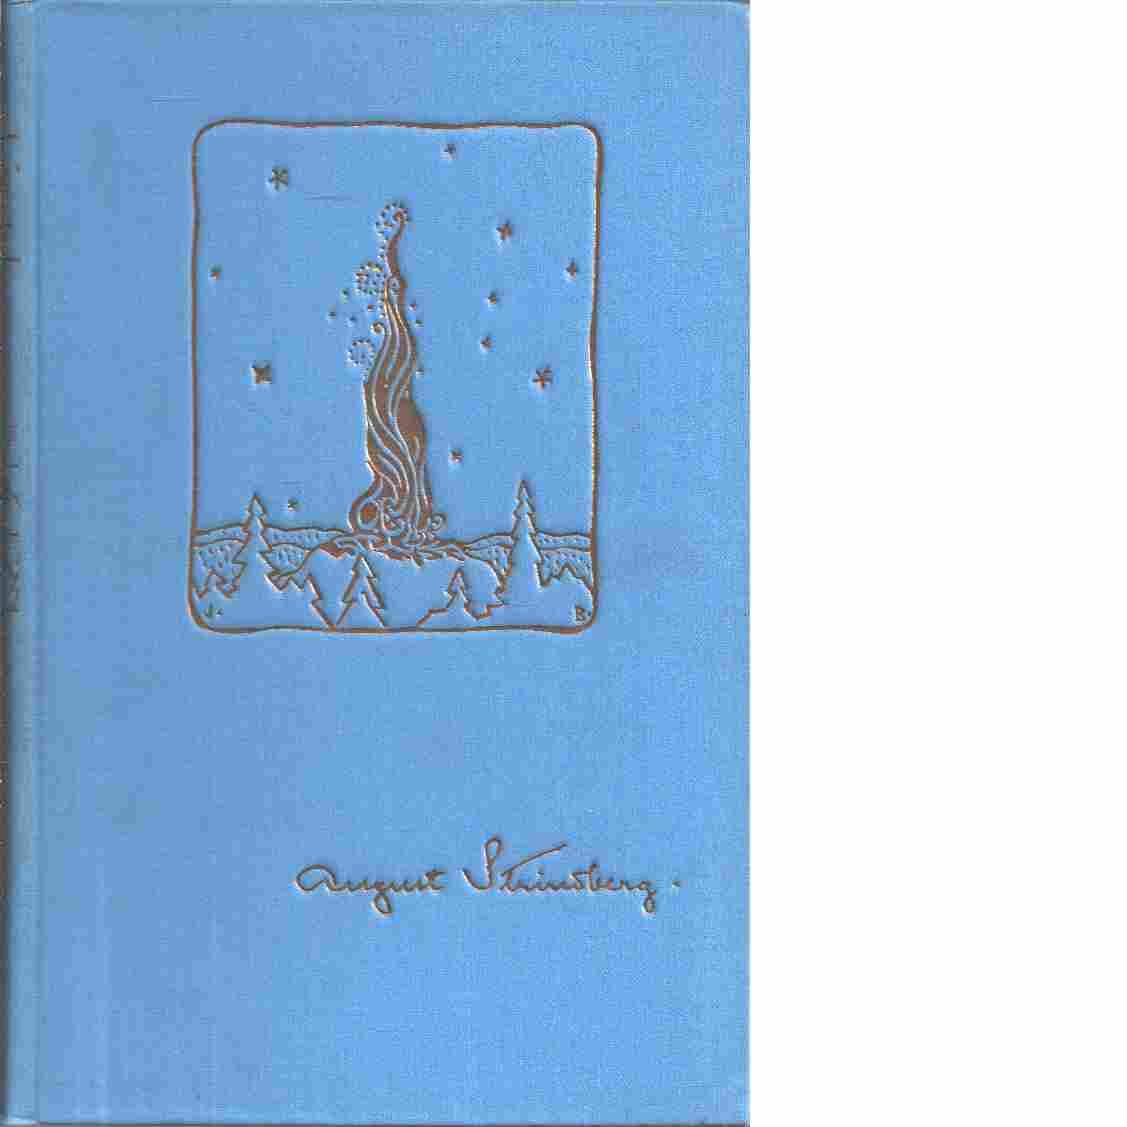 August Strindbergs samlade dikter : tredje delen : Ordalek och småkonst - Strindberg, August